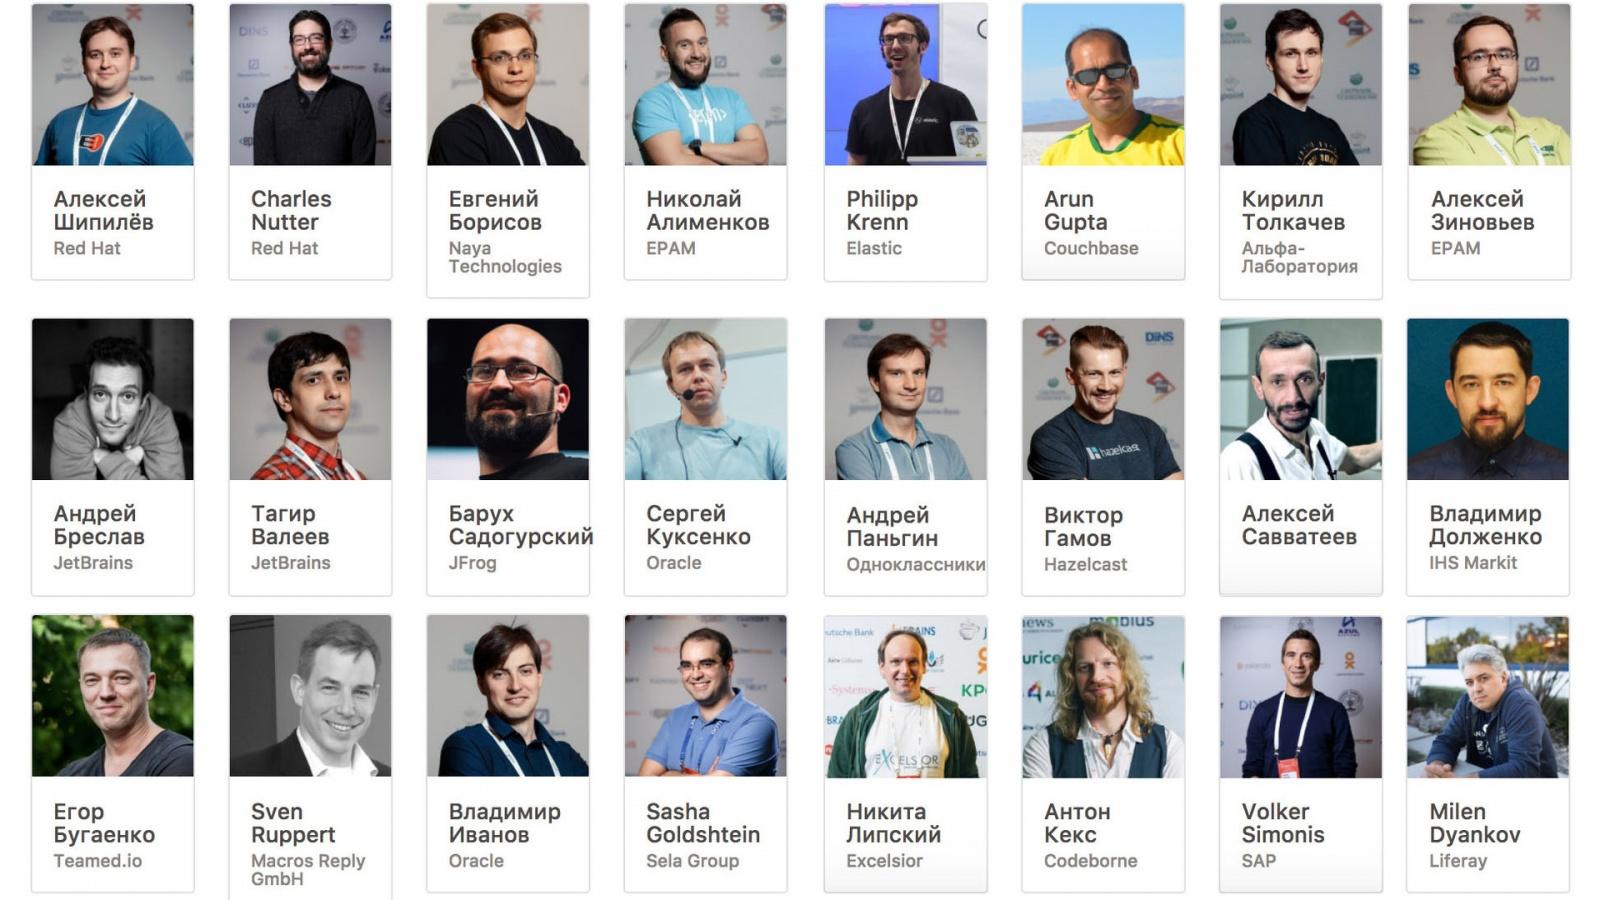 Java-конференция JPoint 2017: Москва, 7-8 апреля — Обзор докладов - 1